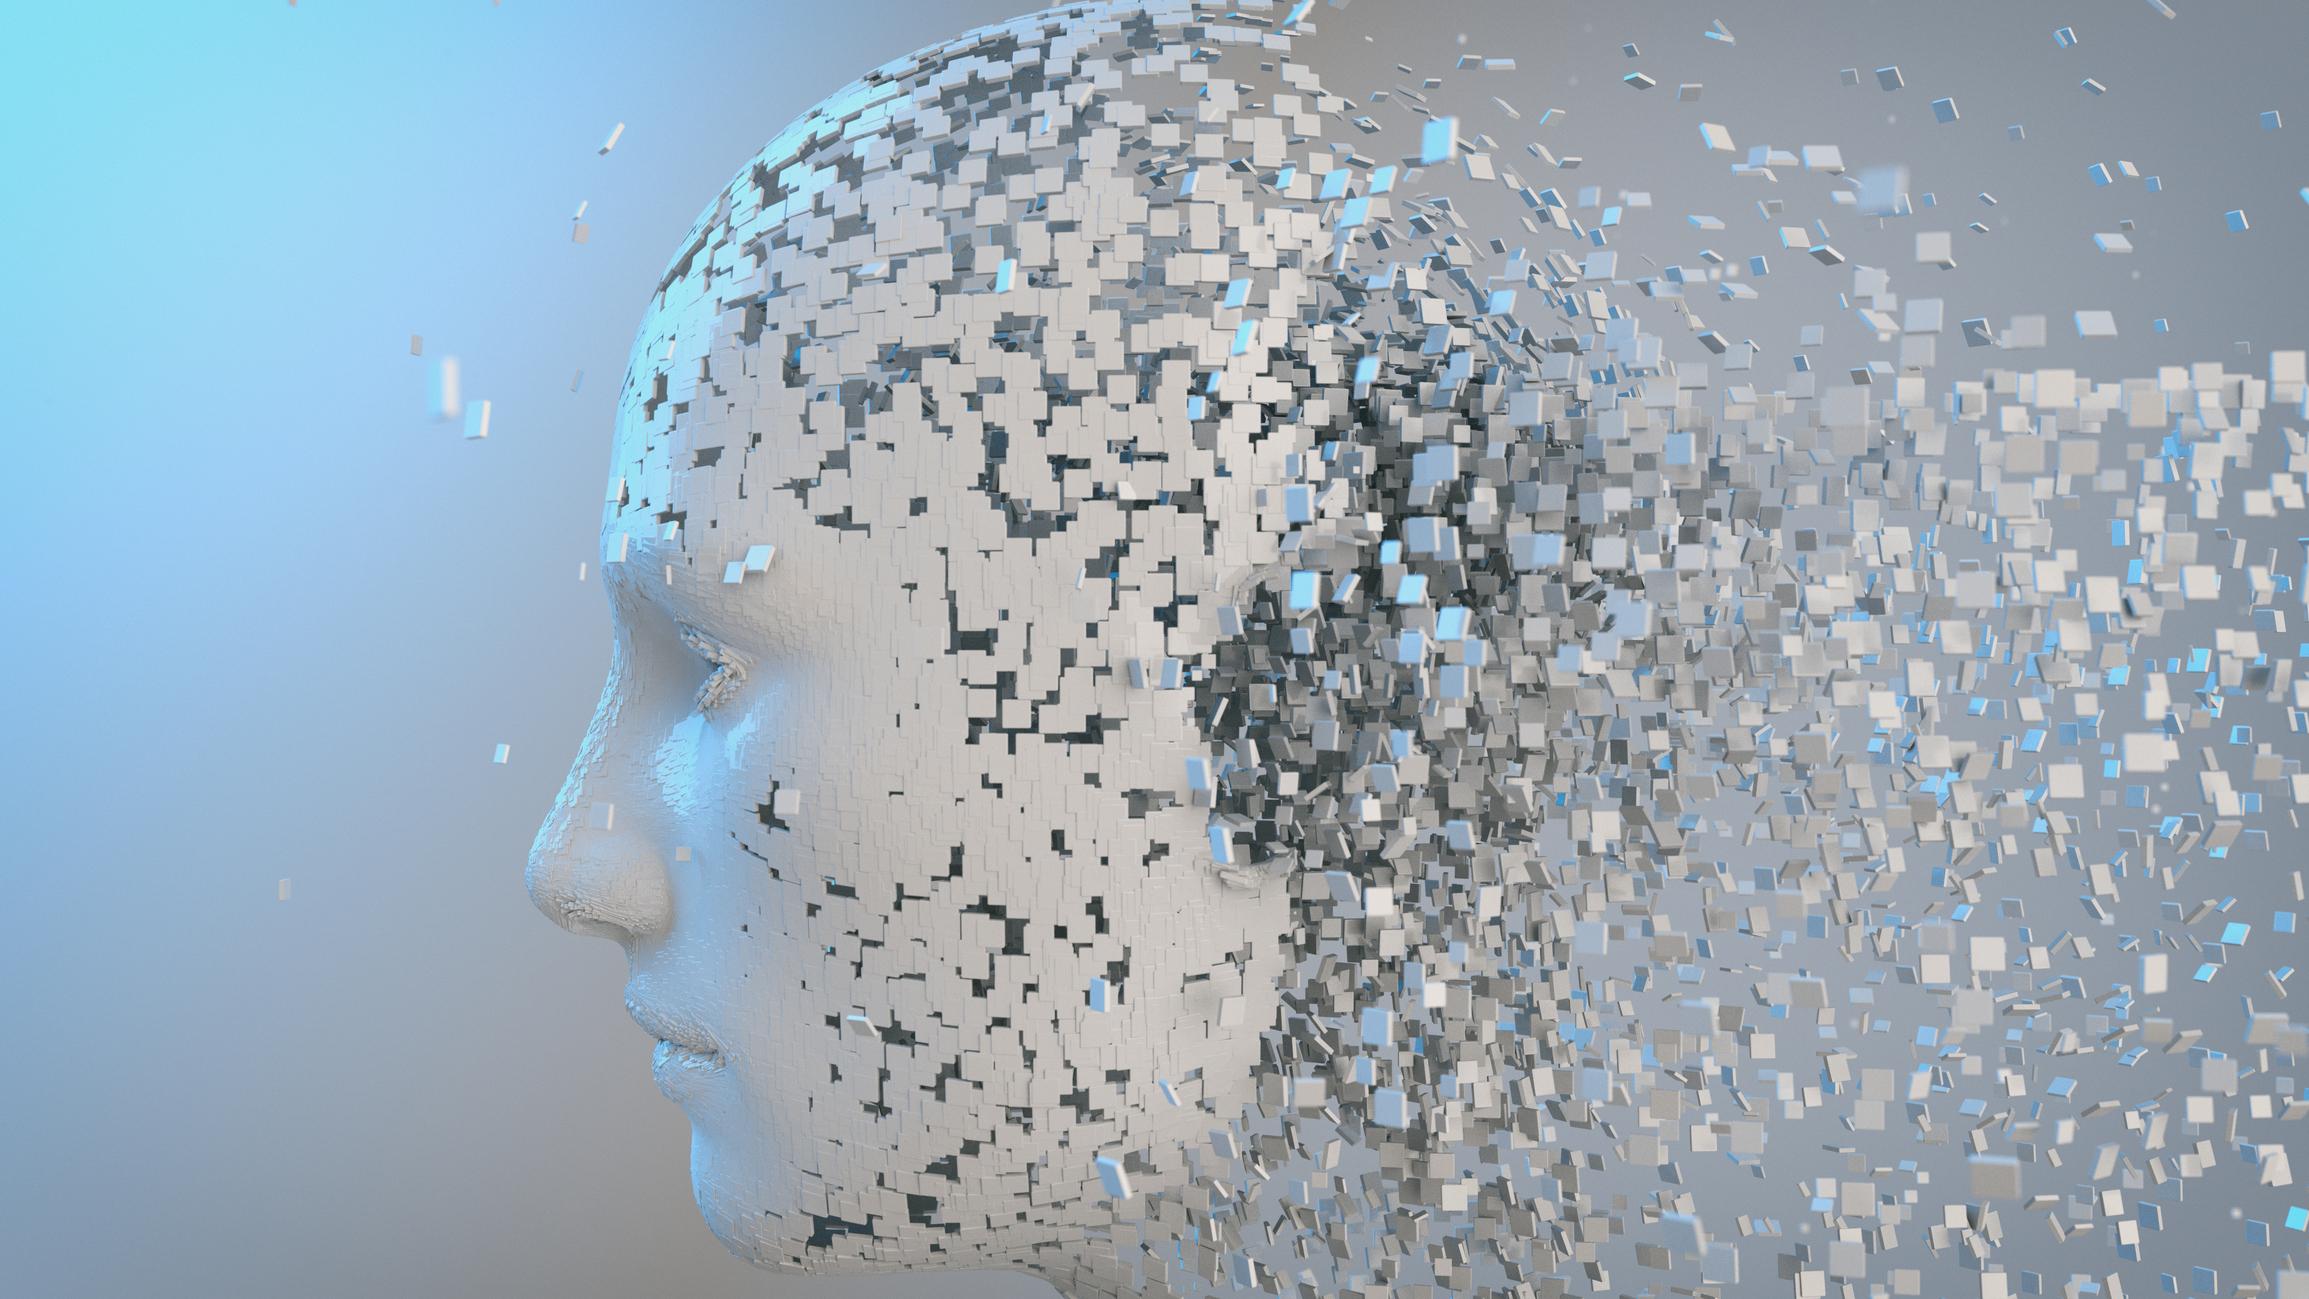 Sectoren | Juridisch Pionierswerk inzake AI en Robotica